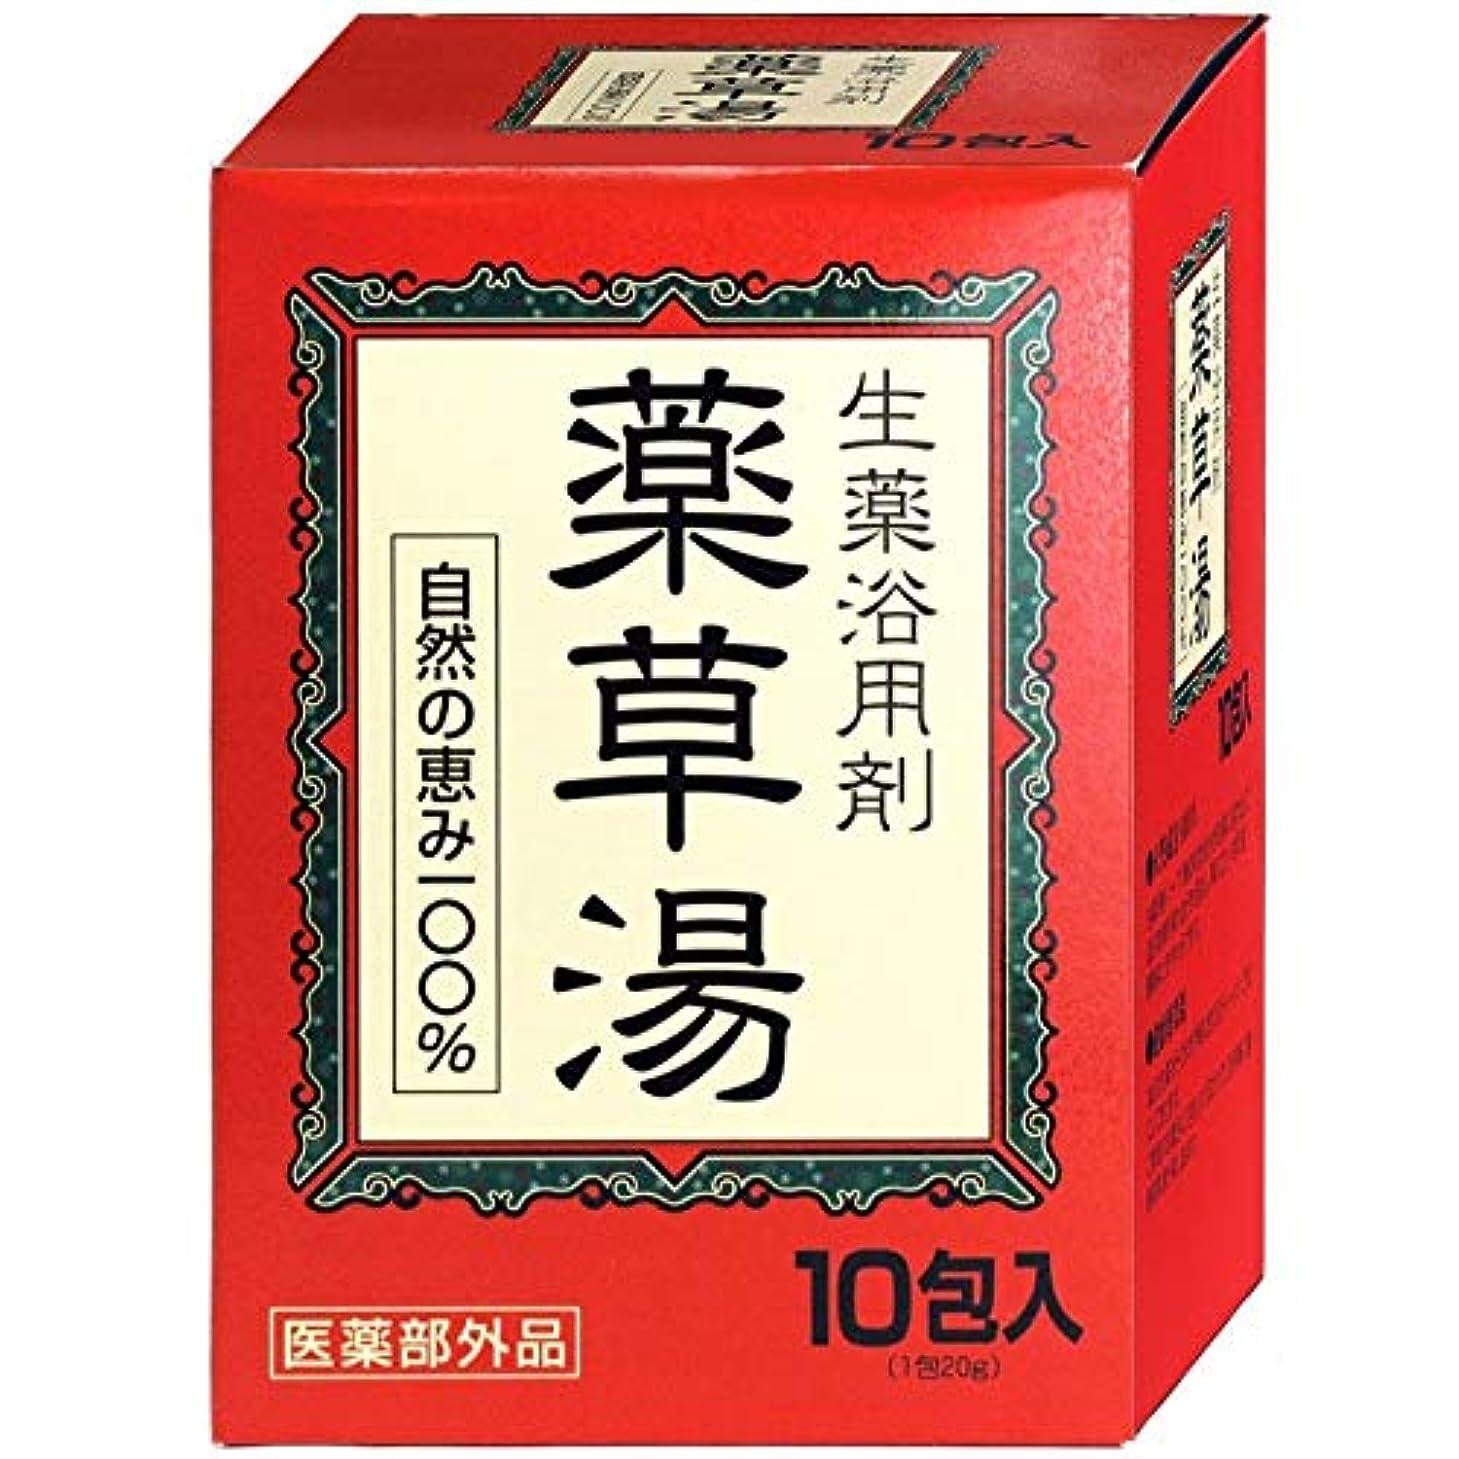 略奪以下山岳VVN生薬入浴剤薬草湯10包×(10セット)